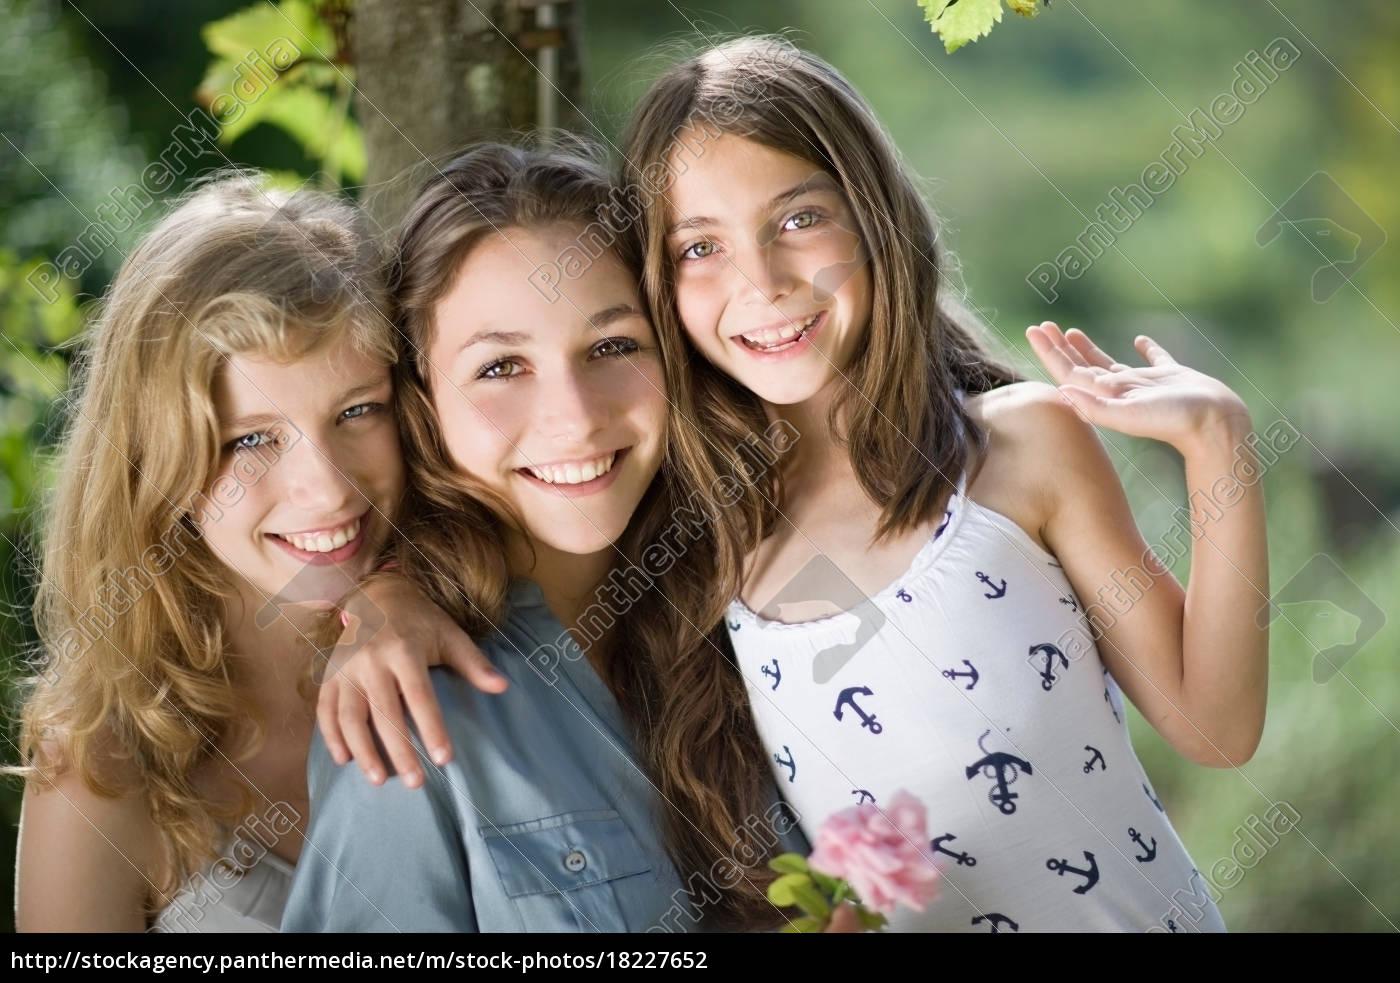 three, girls, hugging, each, other - 18227652